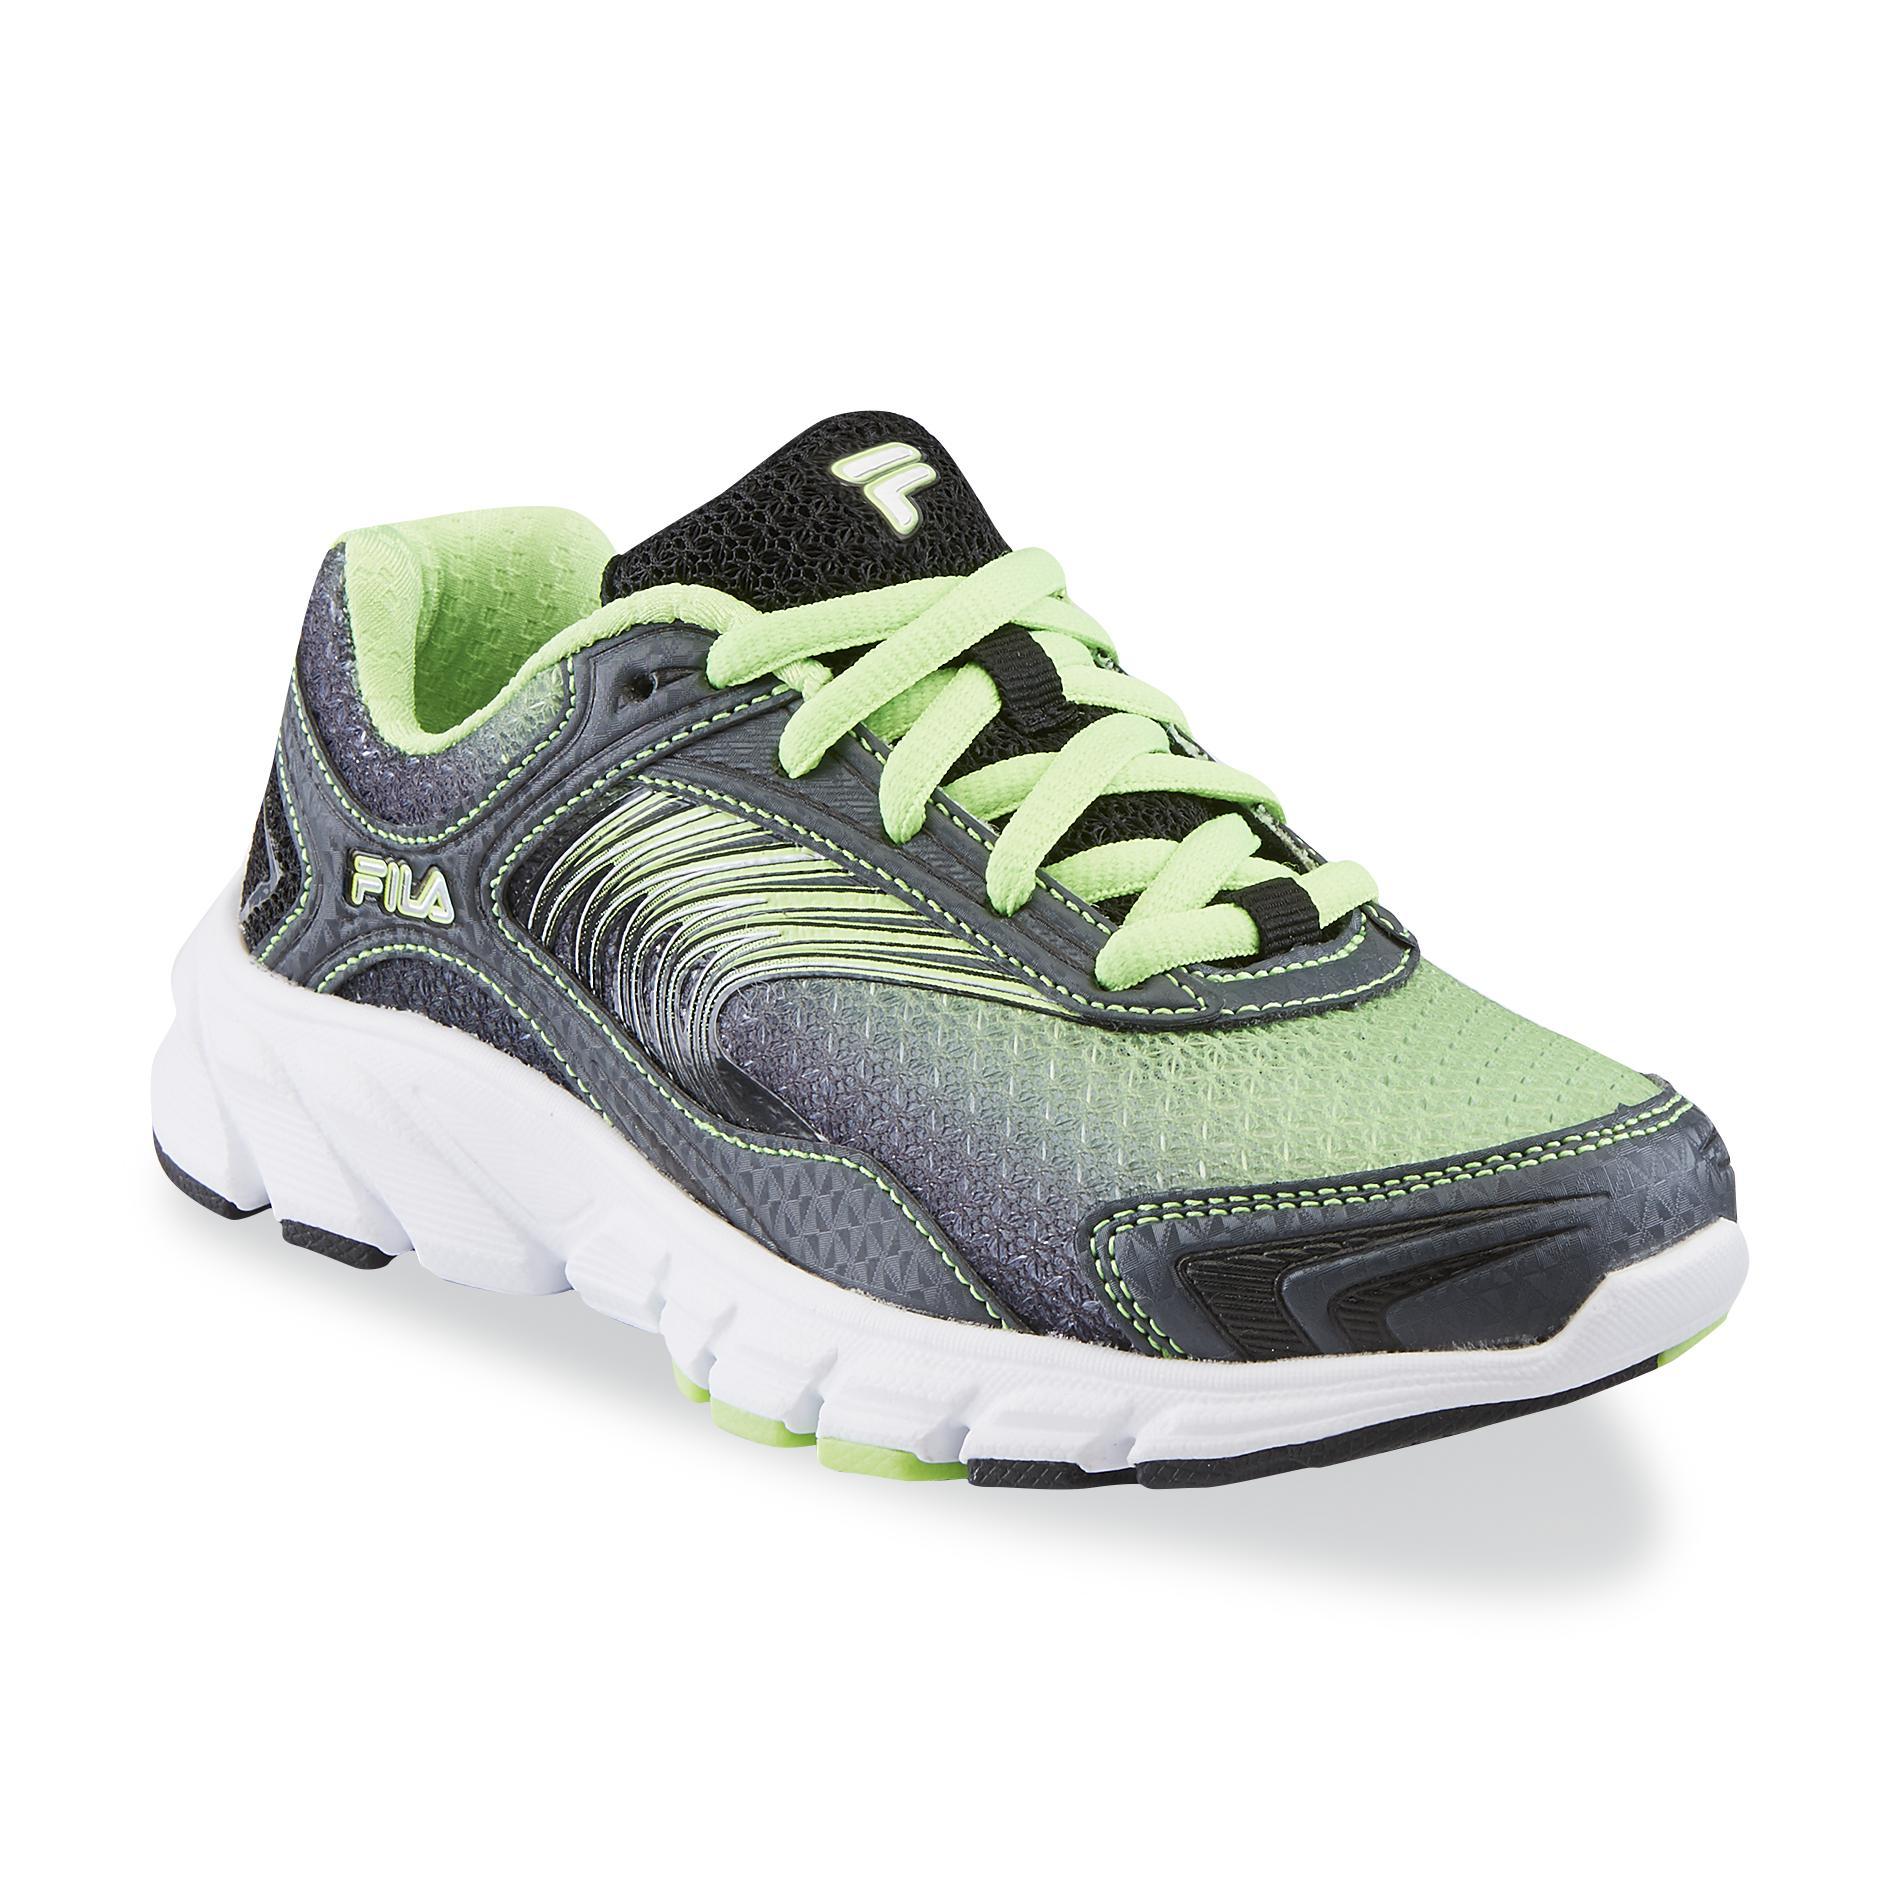 Fila Boys Maranello Neon GreenBlackGray Running Shoe